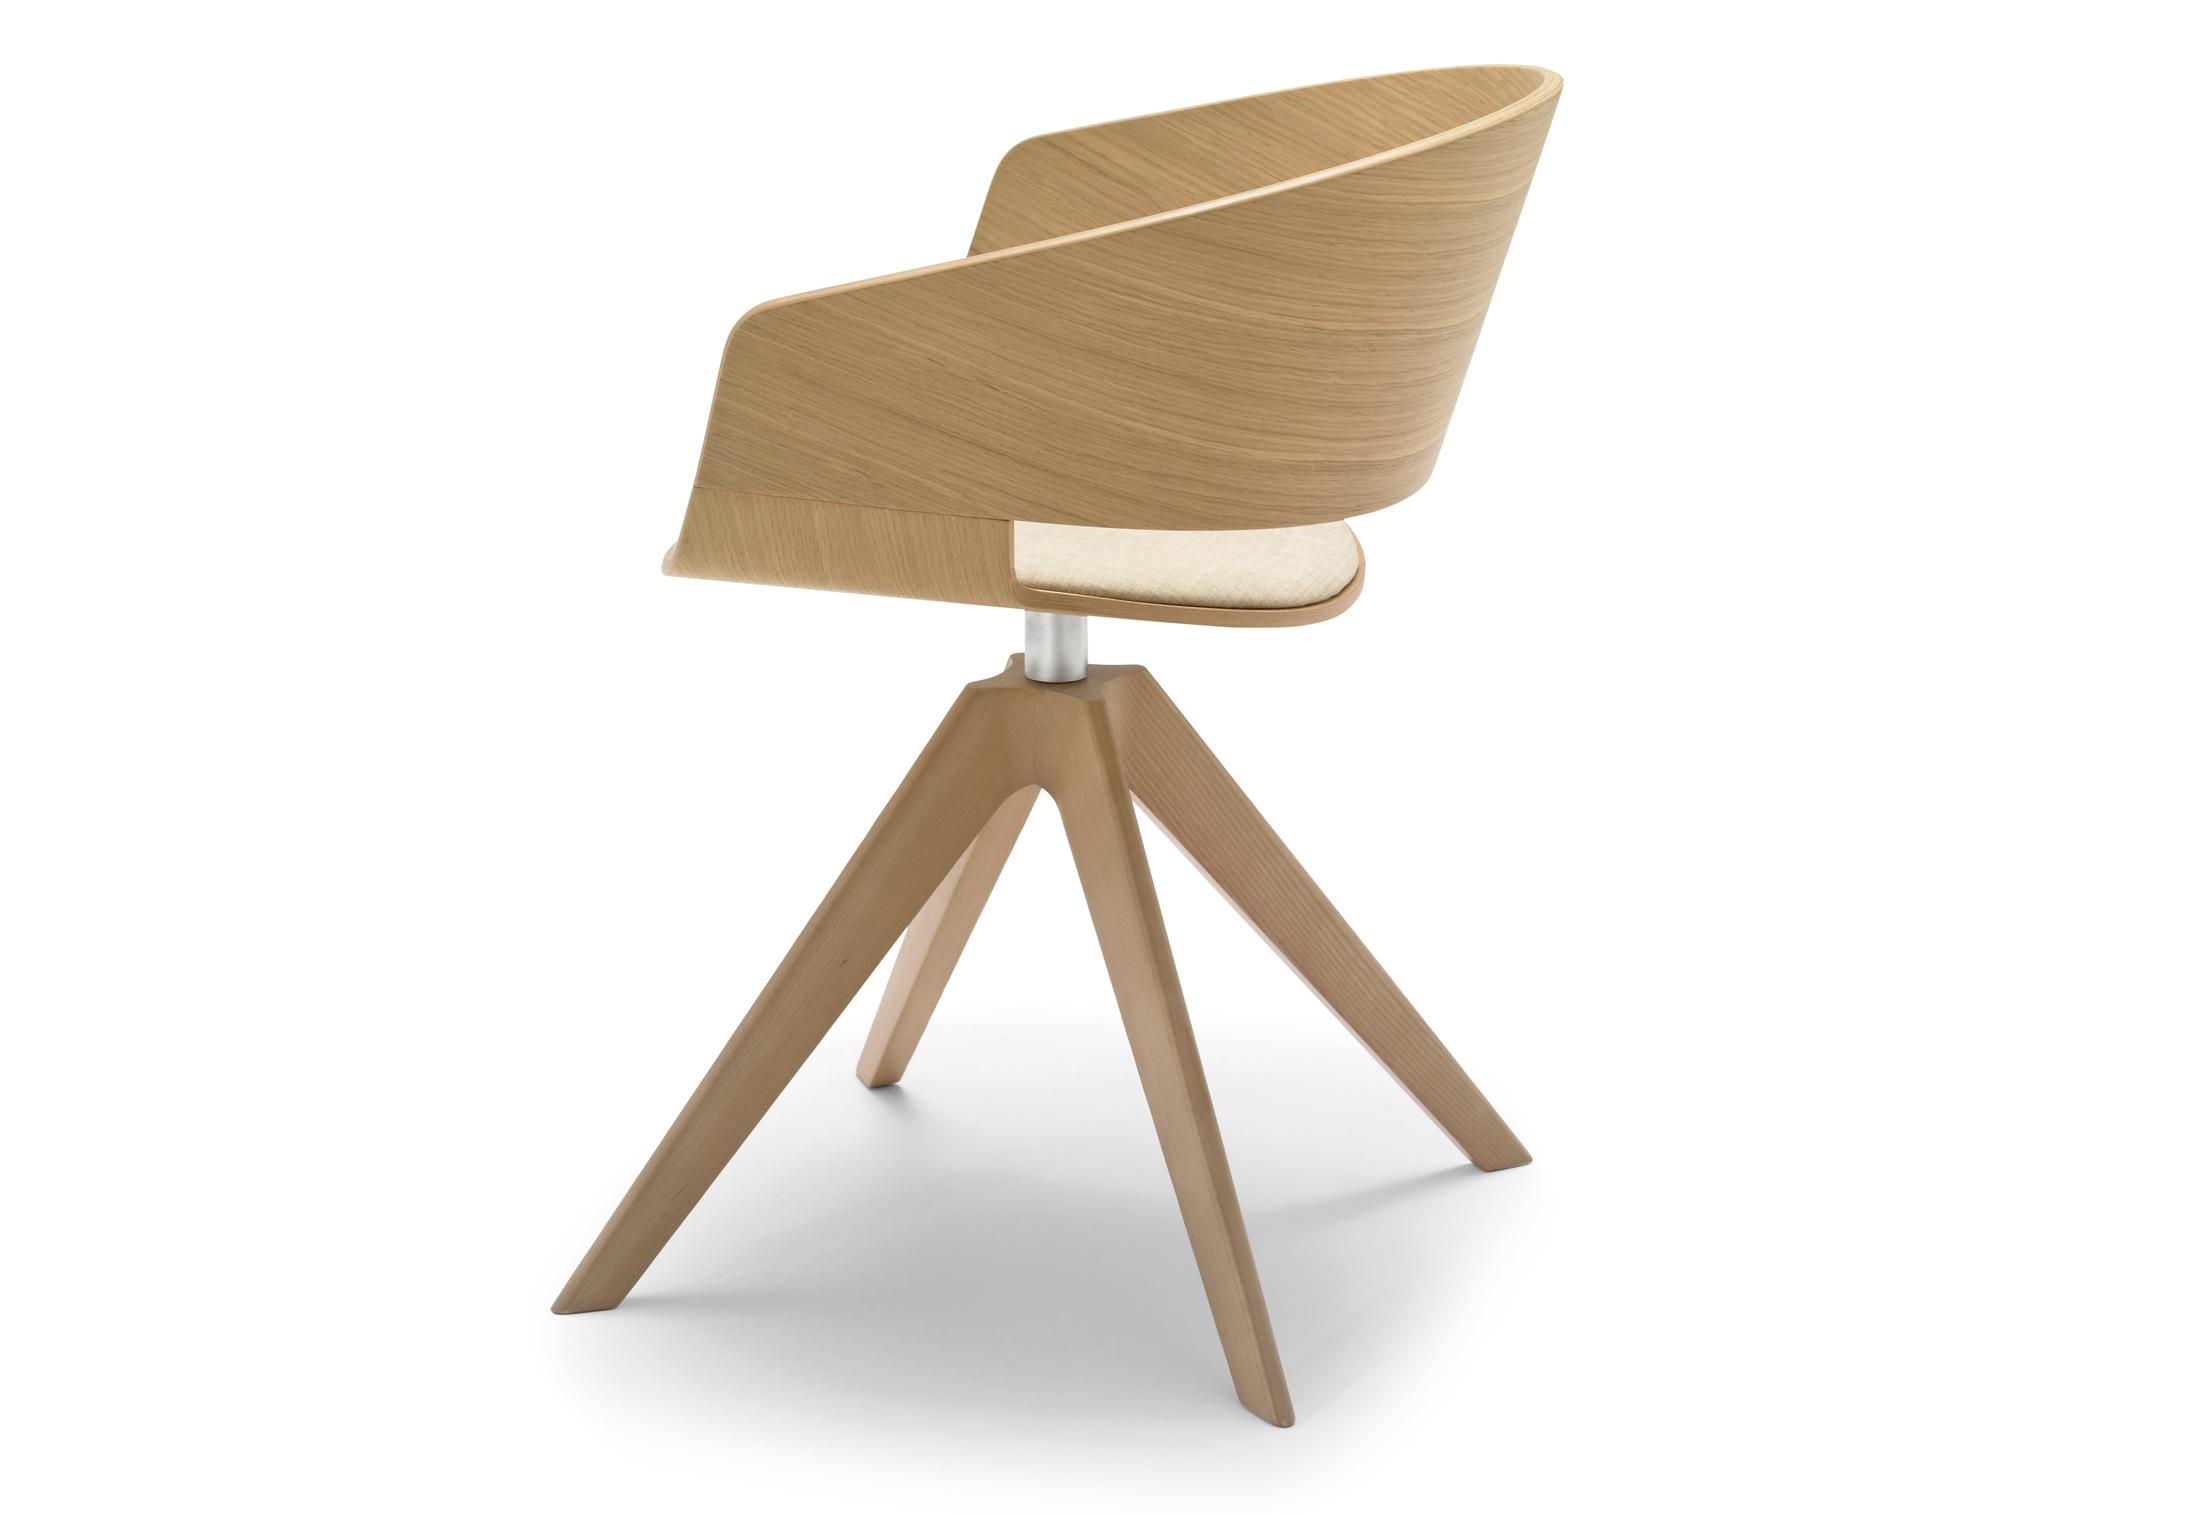 Drehstuhl weiß holz  Ronda Drehstuhl Holz von Andreu World | STYLEPARK